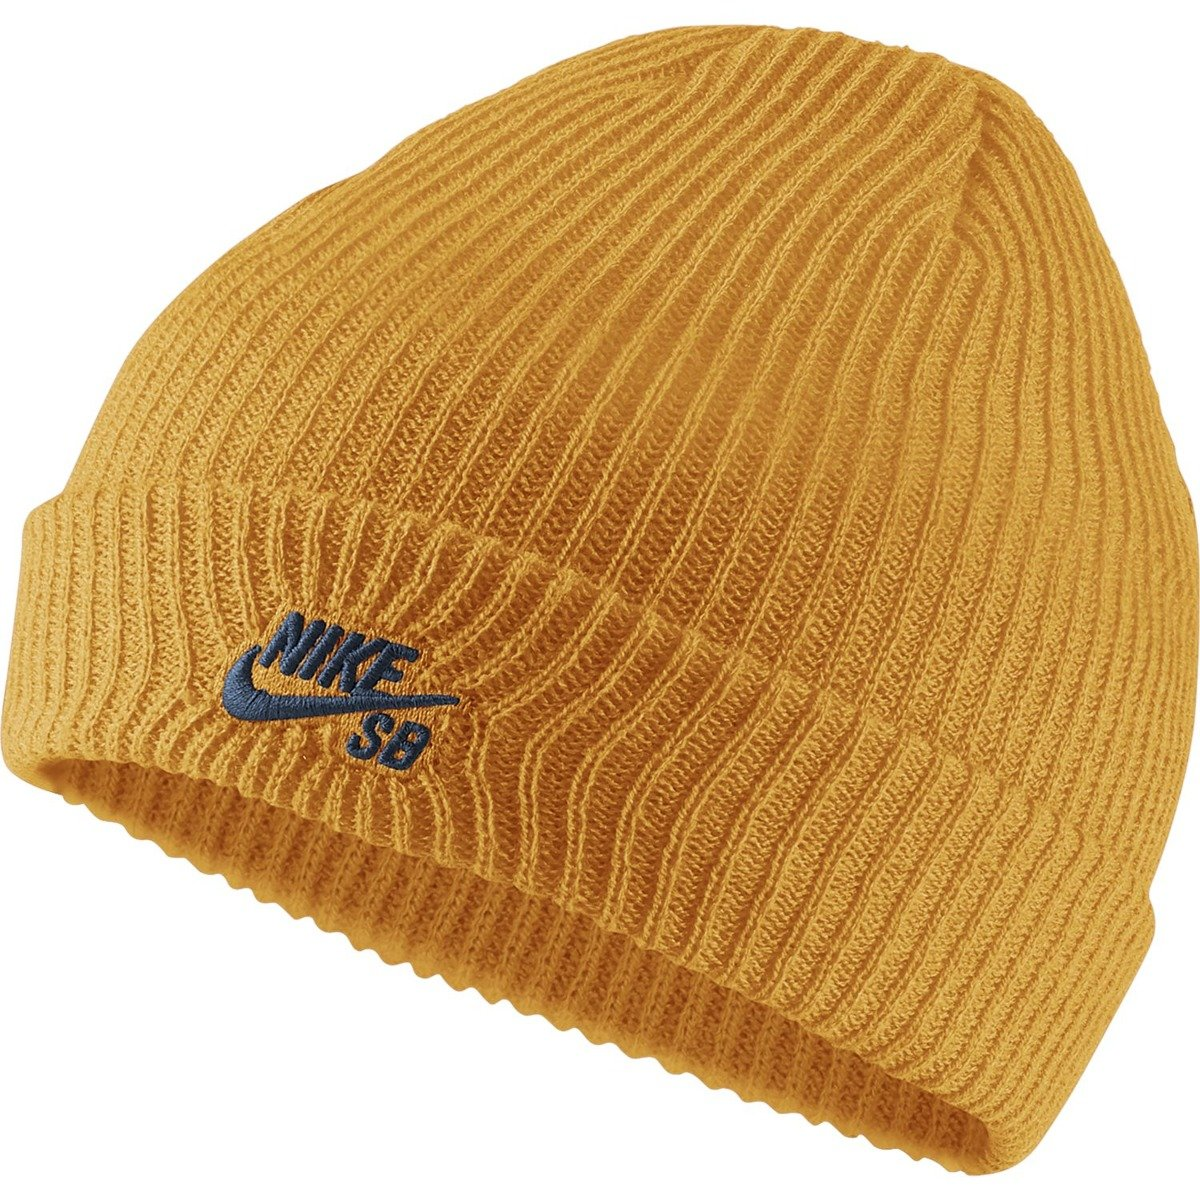 e8e8856f18dc5c nike sb fisherman beanie Yellow Ochre/obsidian yellow | Clothes \ Cap \  Beanie Brands \ Nike SB Produkt Na Prezent ALL | Skateshop Miniramp.pl